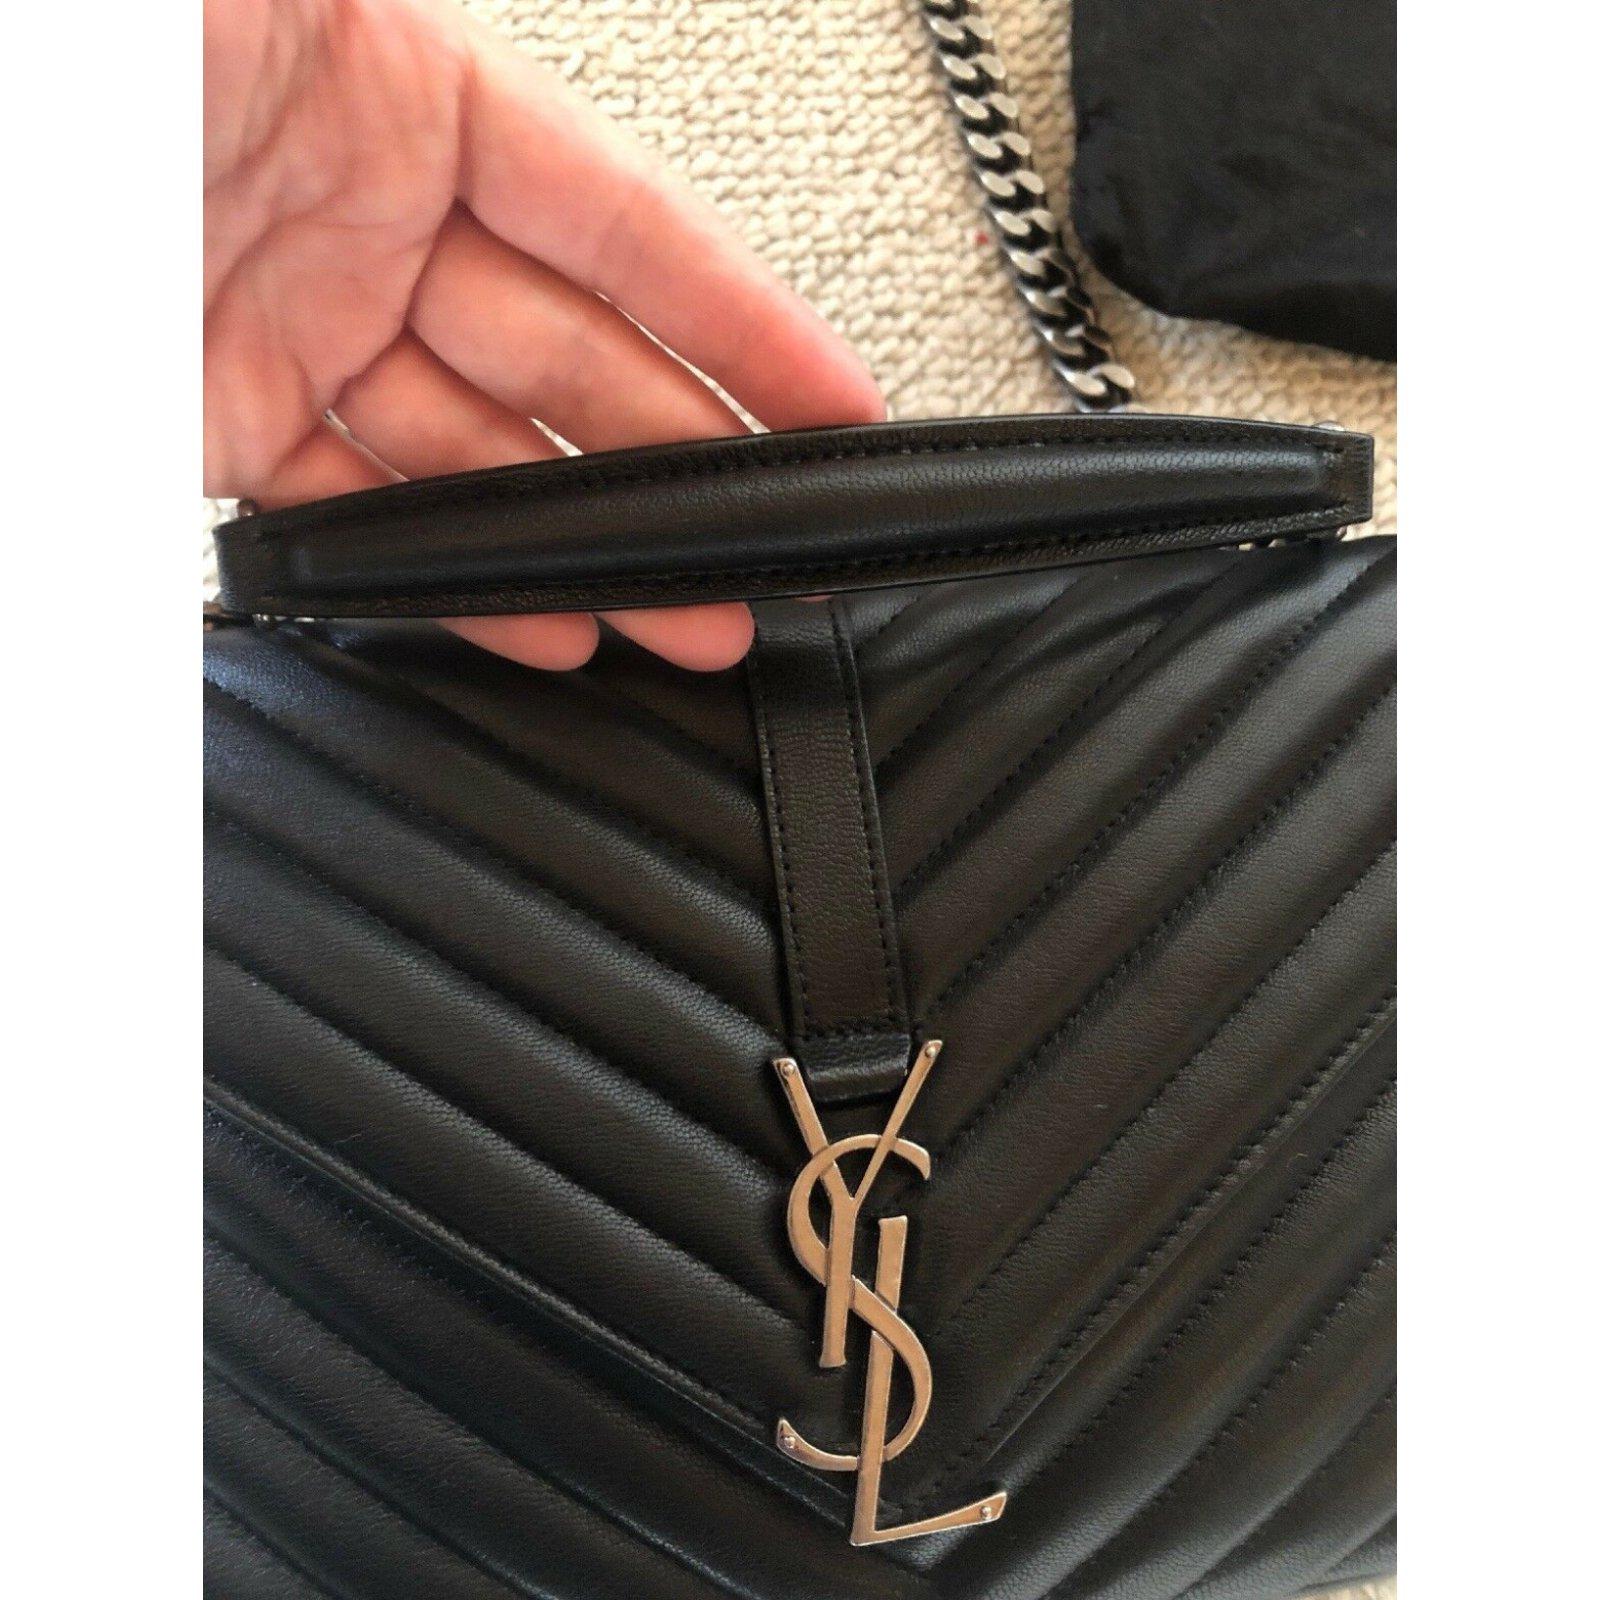 Saint Laurent Saint Laurent middle school Handbags Leather Black ref.107147  - Joli Closet 9c488309f141b